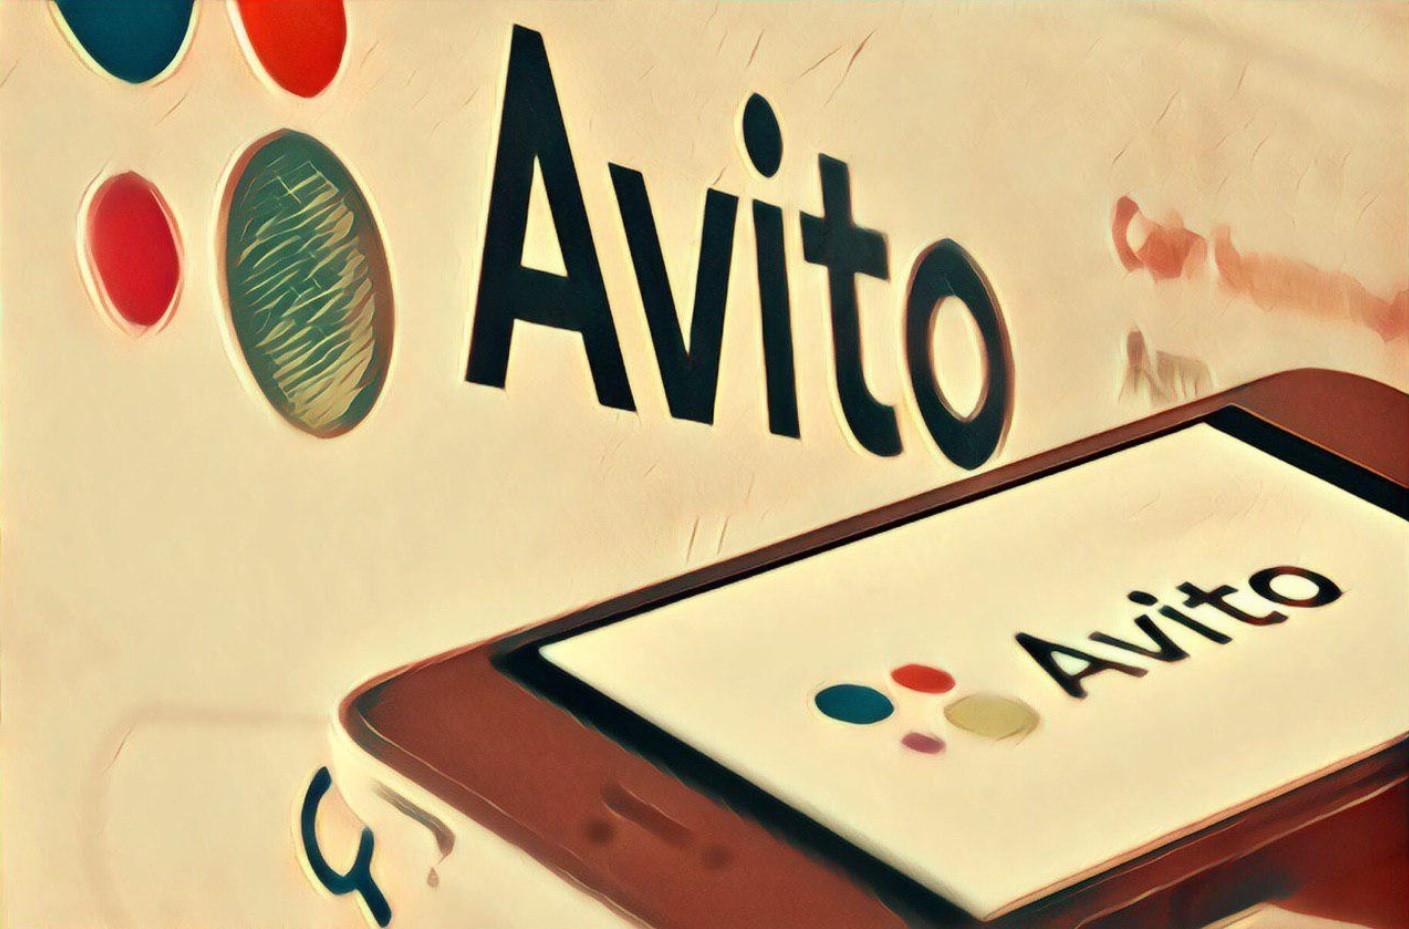 Как найти свое объявление на Авито